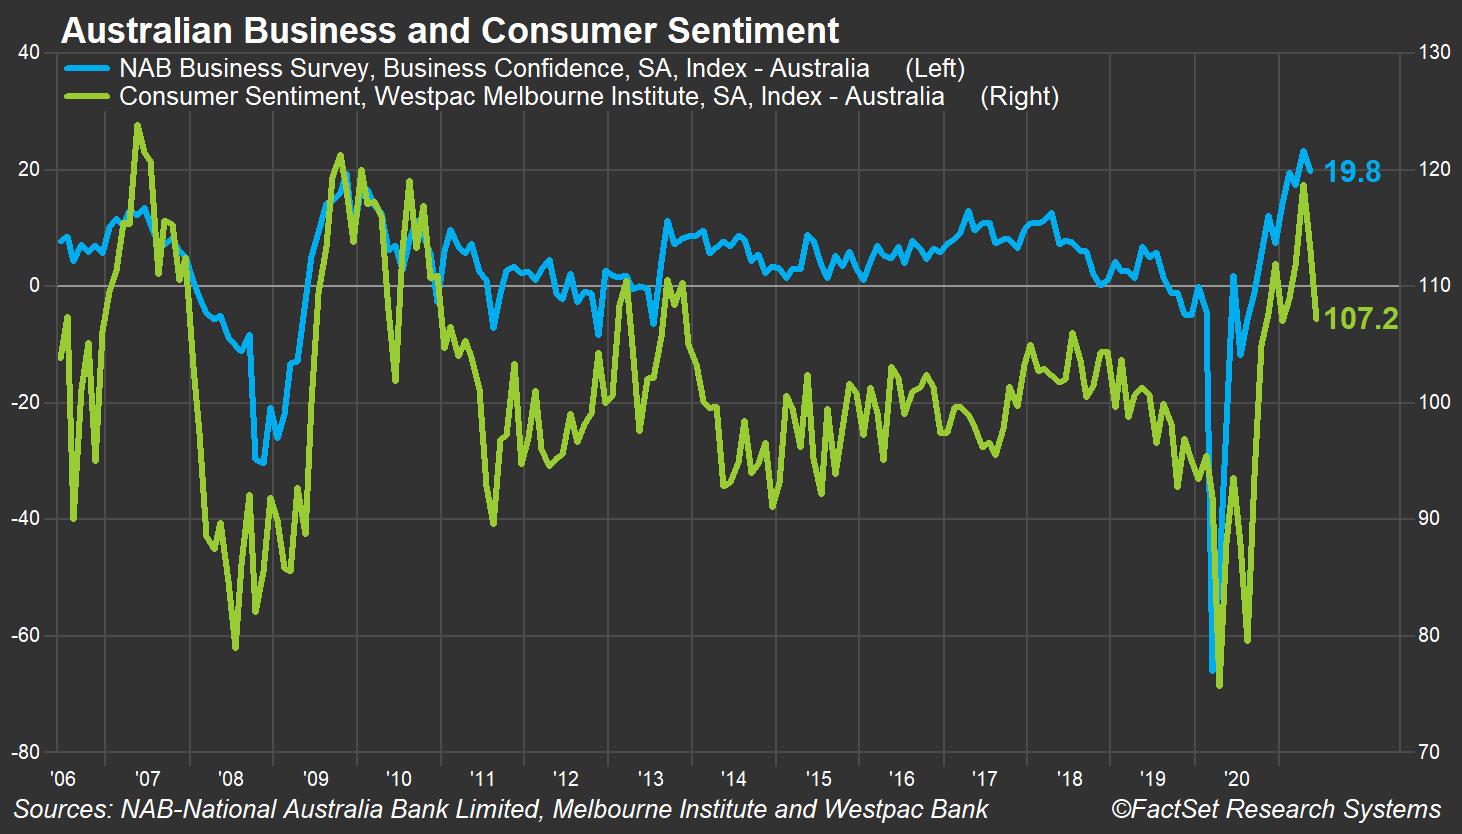 Australian Business and Consumer Sentiment